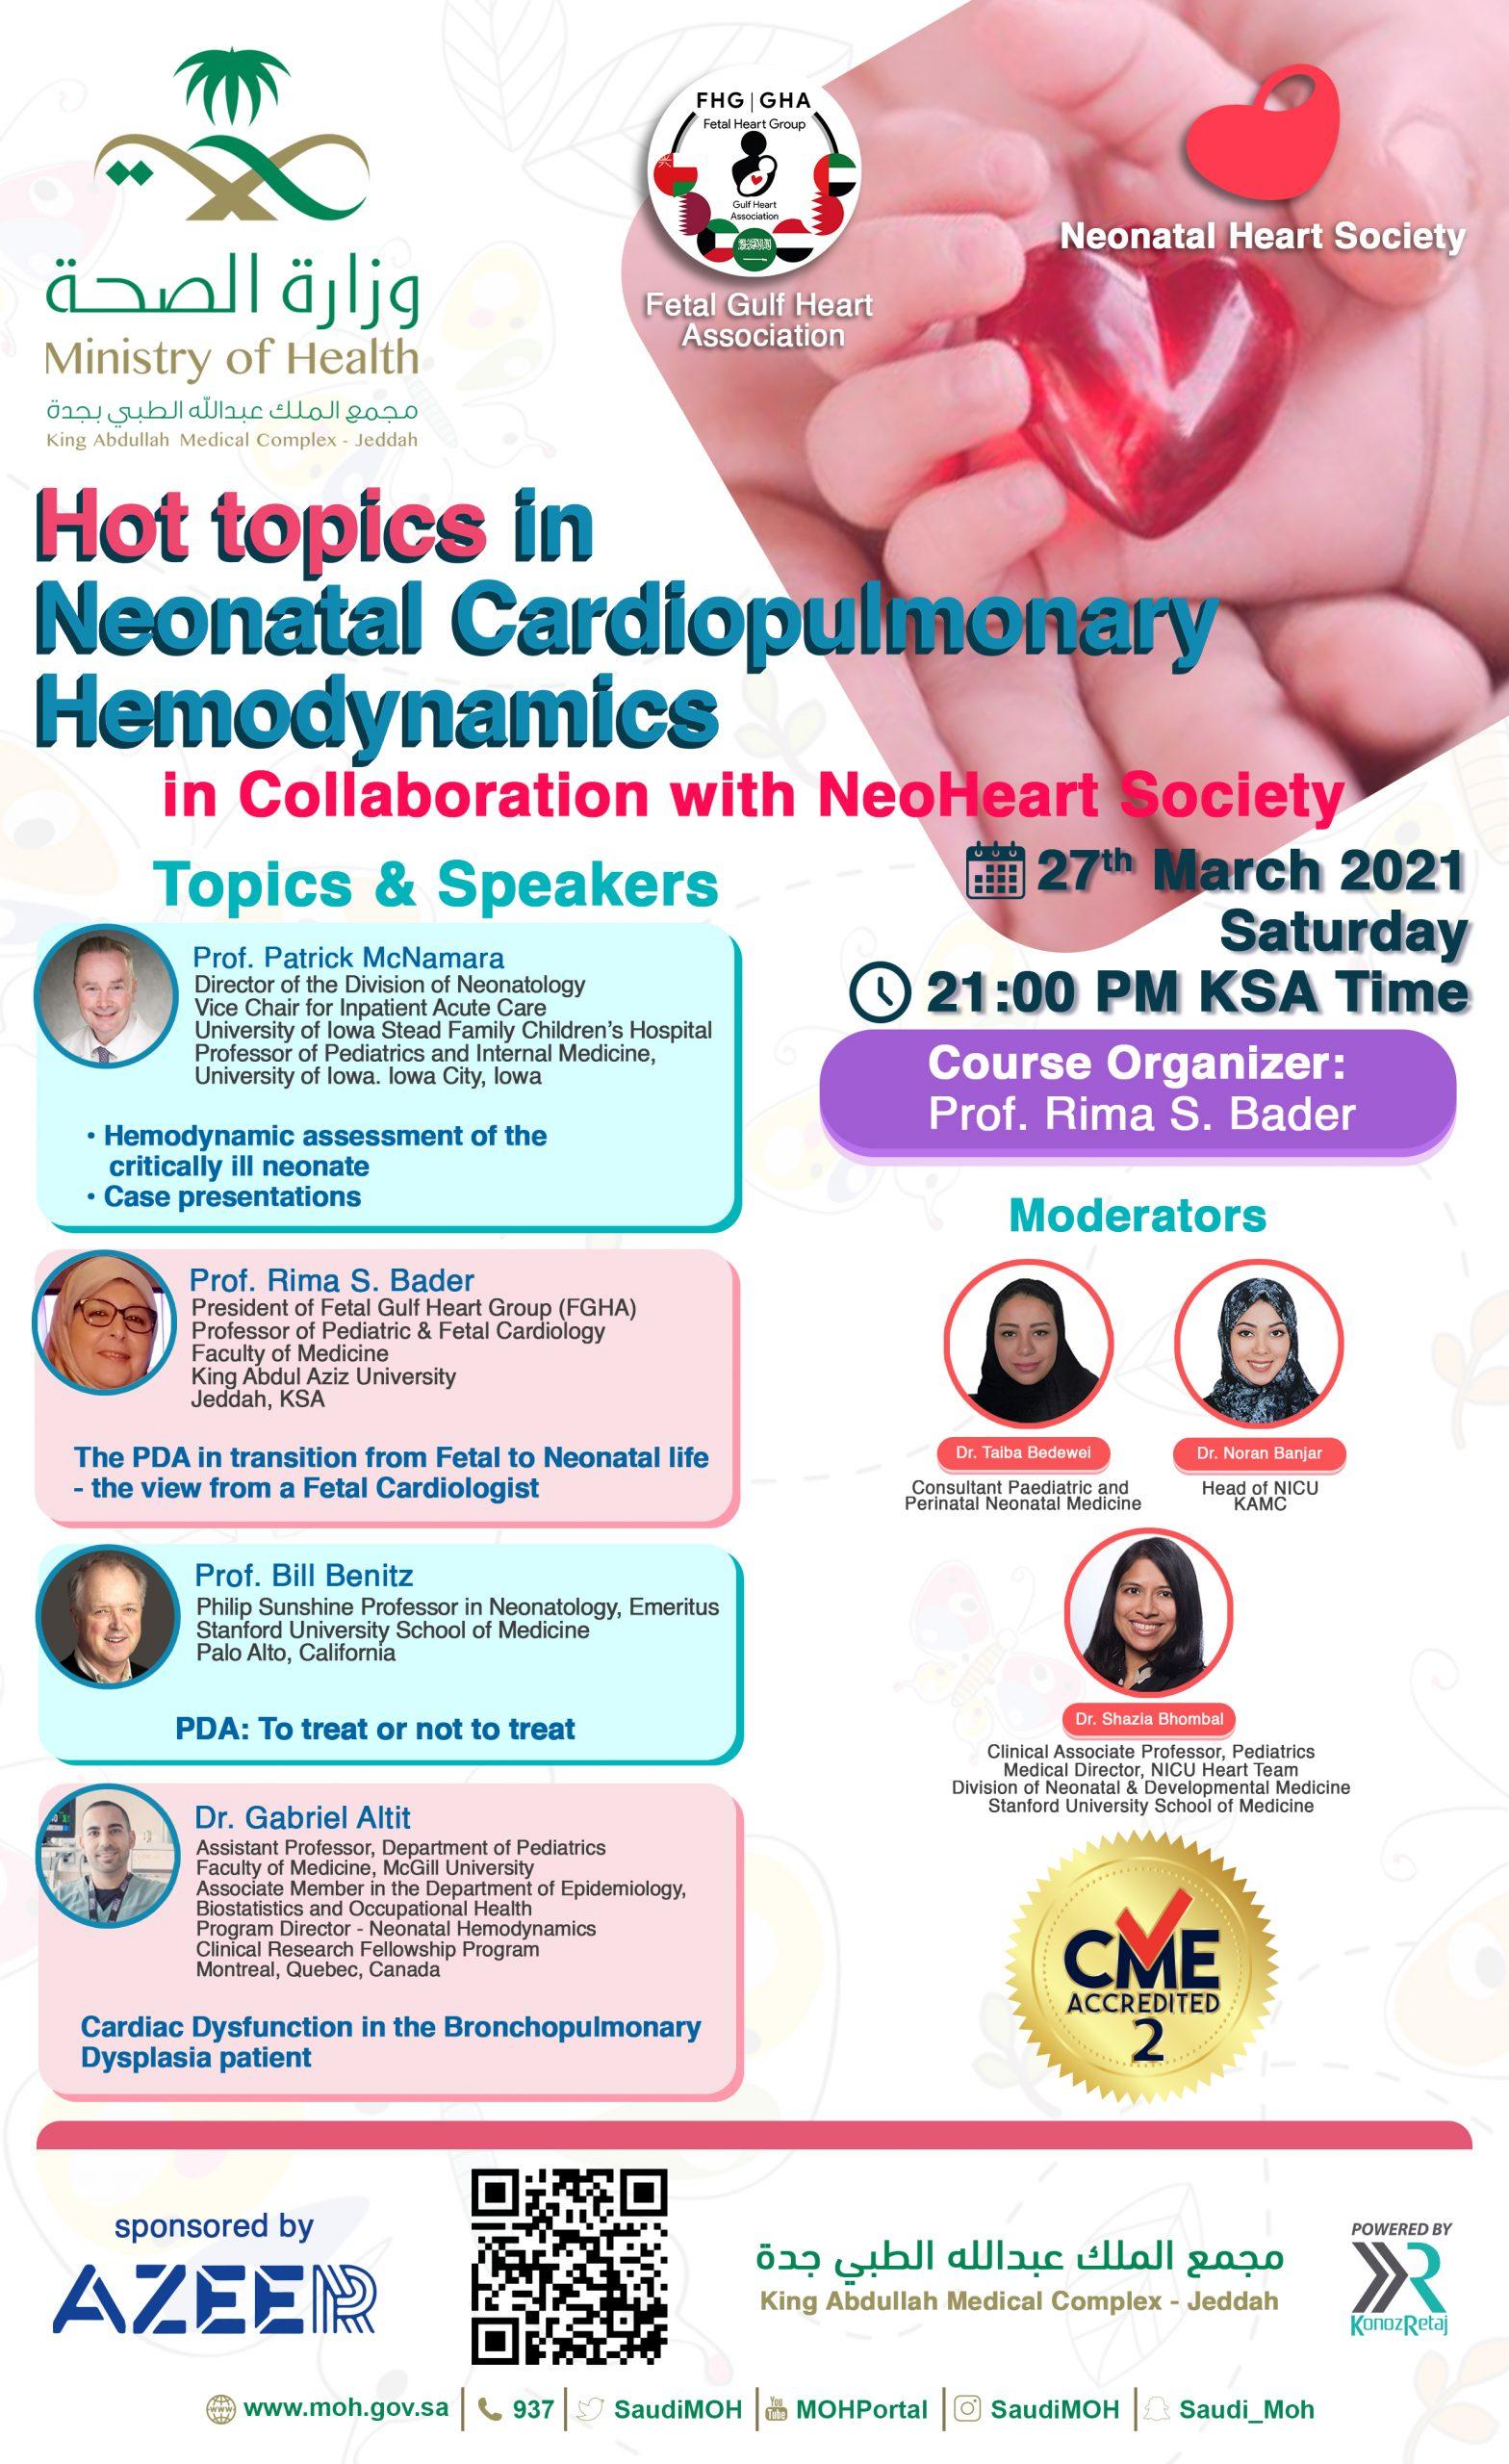 Hot Topics in Neonatal Cardiopulmonary Hemodynamics